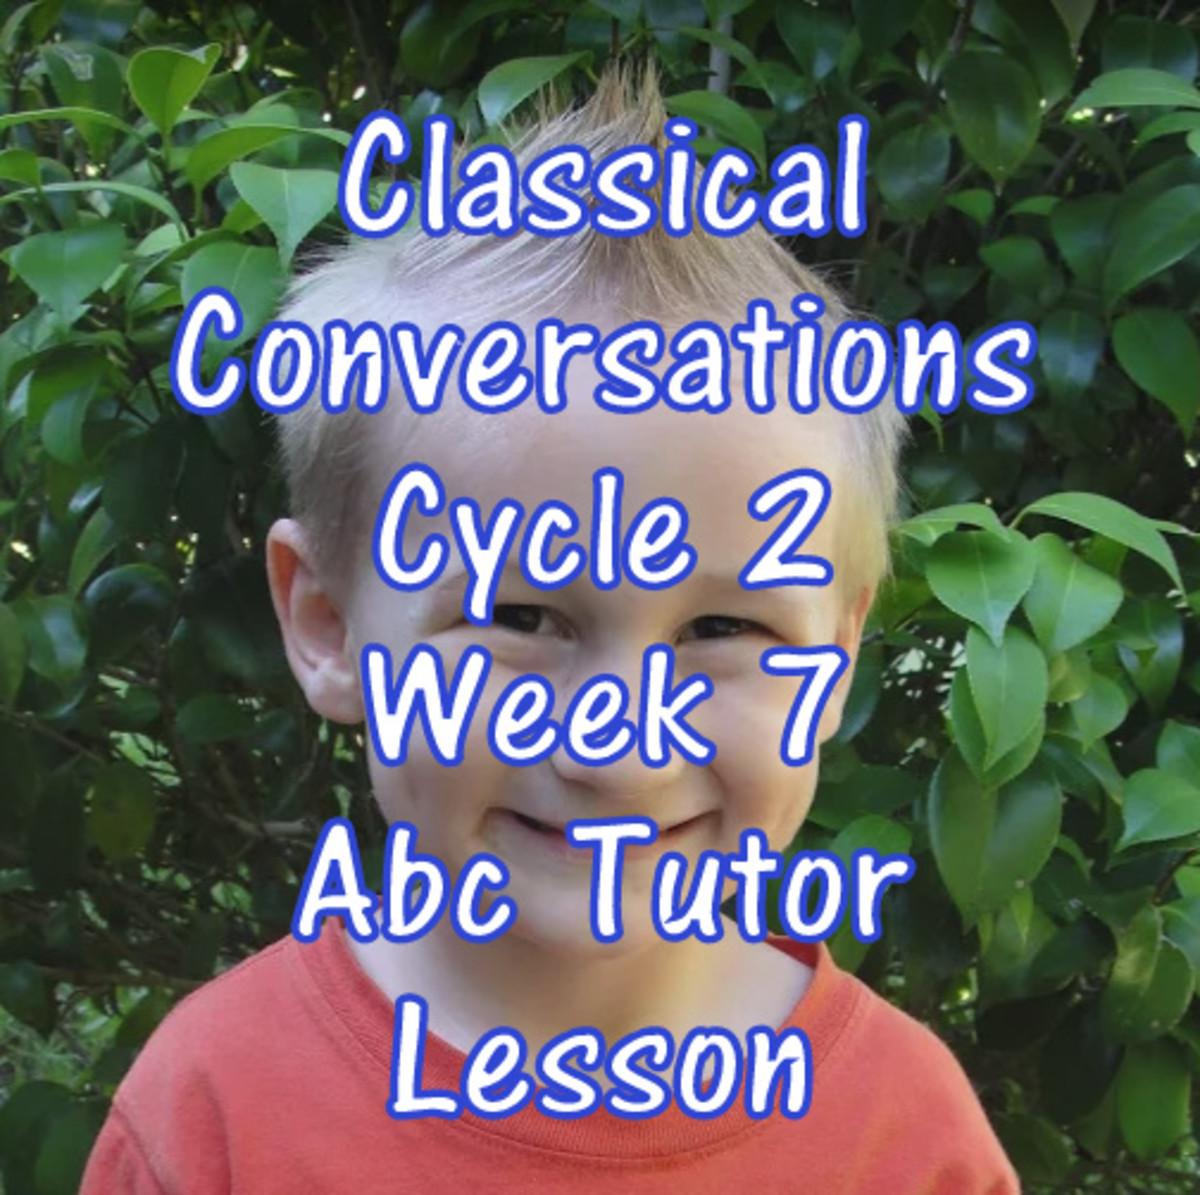 Cc Cycle 2 Week 7 Lesson For Abecedarian Tutors